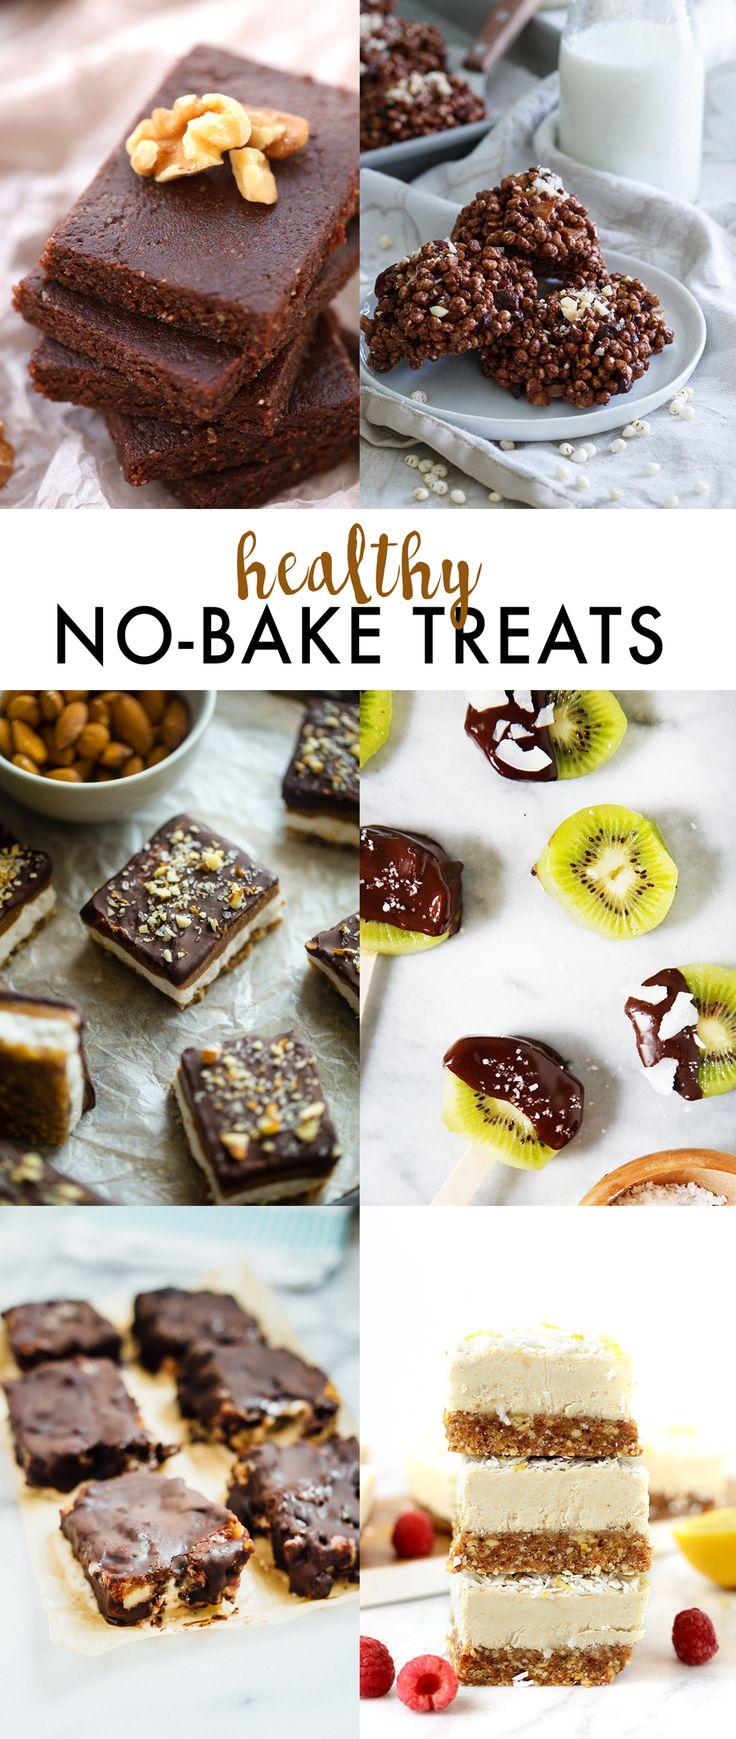 HealthY No Bake Treats recipe idea